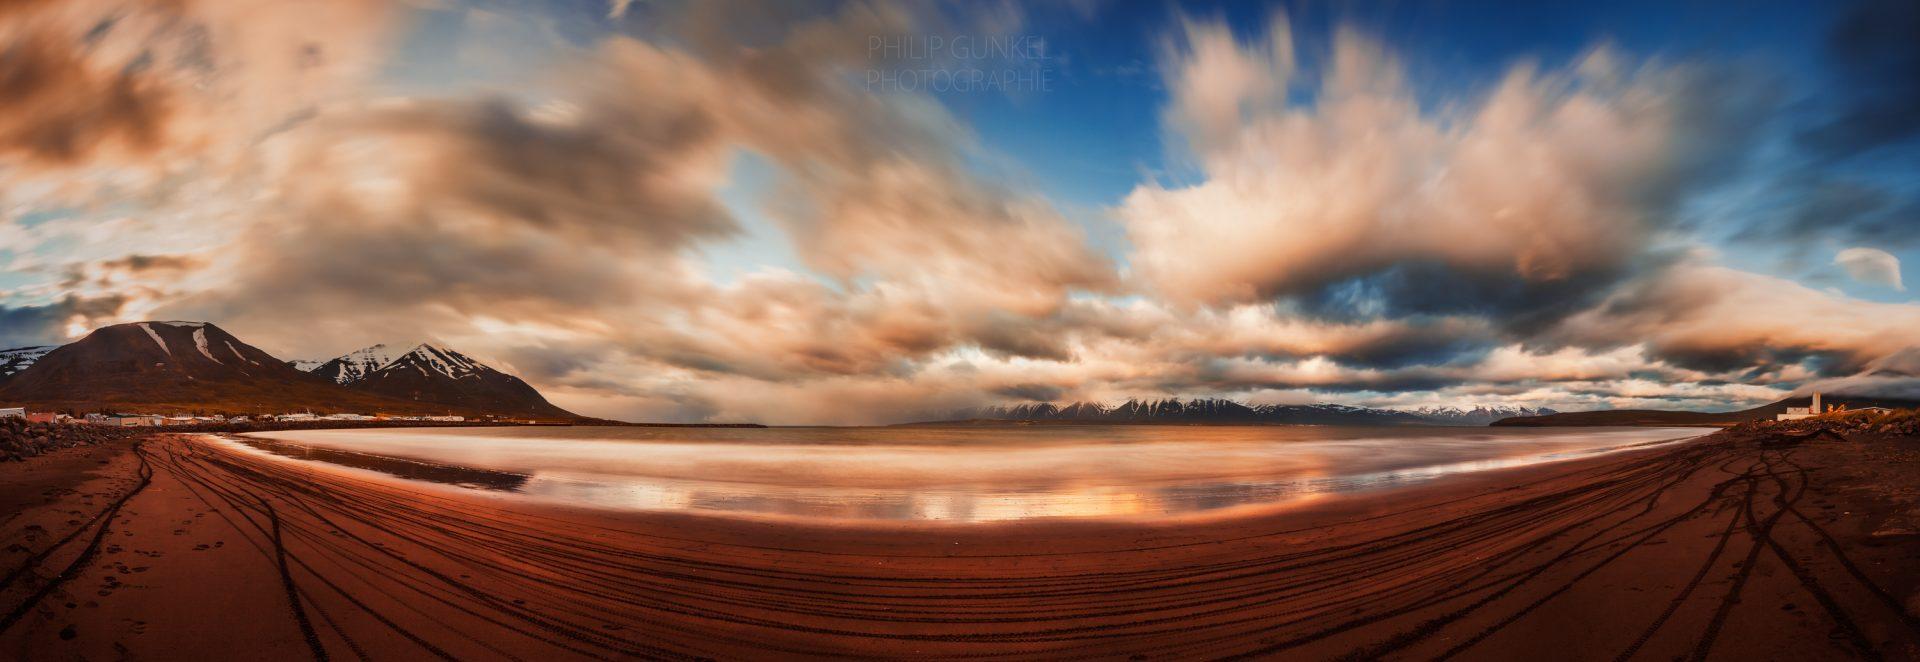 Untitled_Panorama134